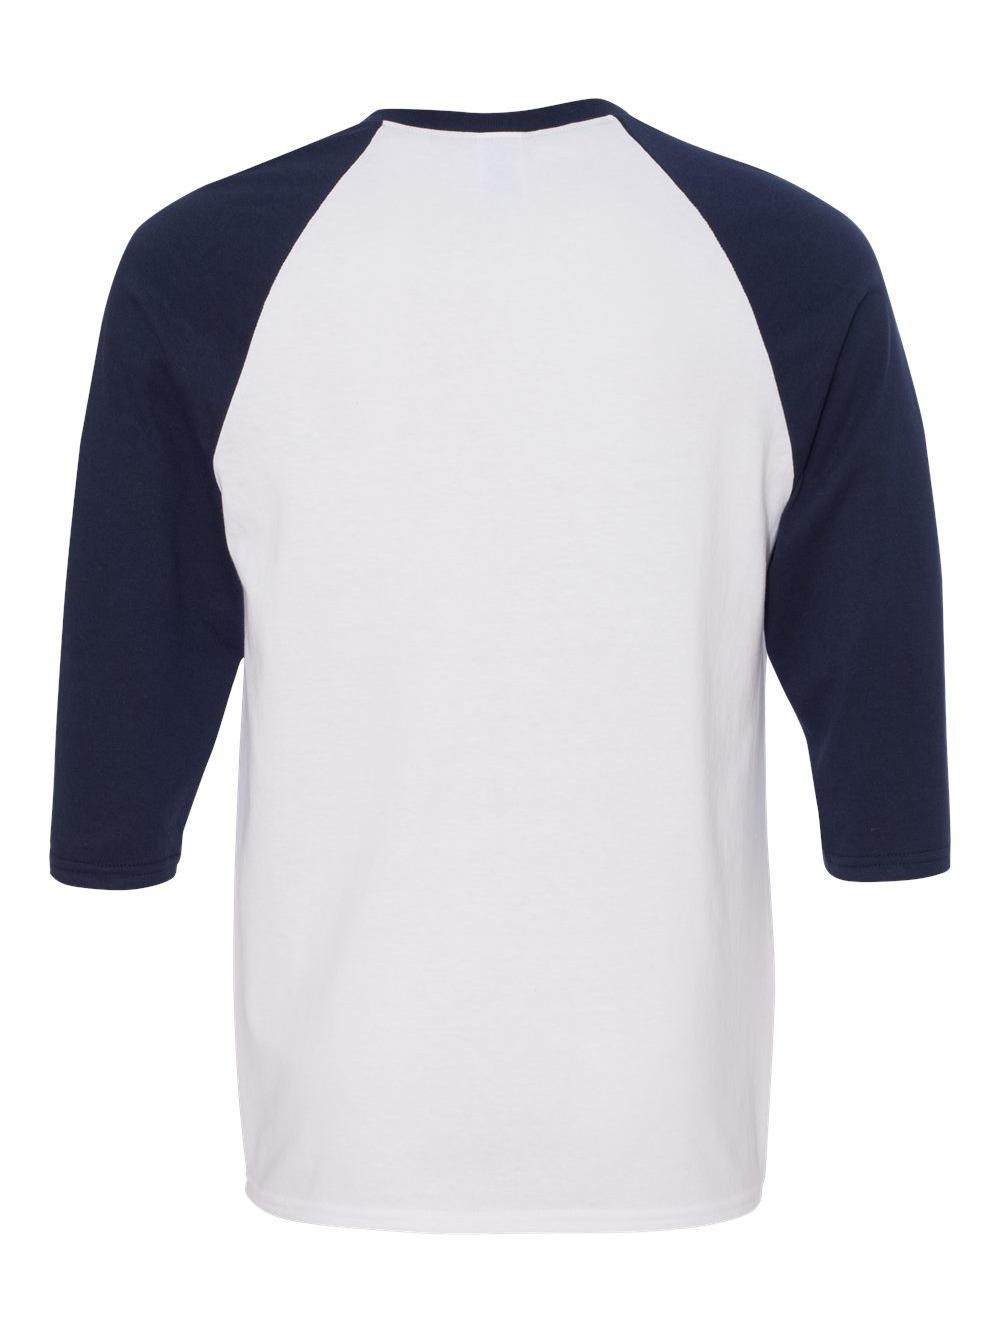 Gildan-Heavy-Cotton-Three-Quarter-Raglan-Sleeve-Baseball-T-Shirt-5700 thumbnail 34